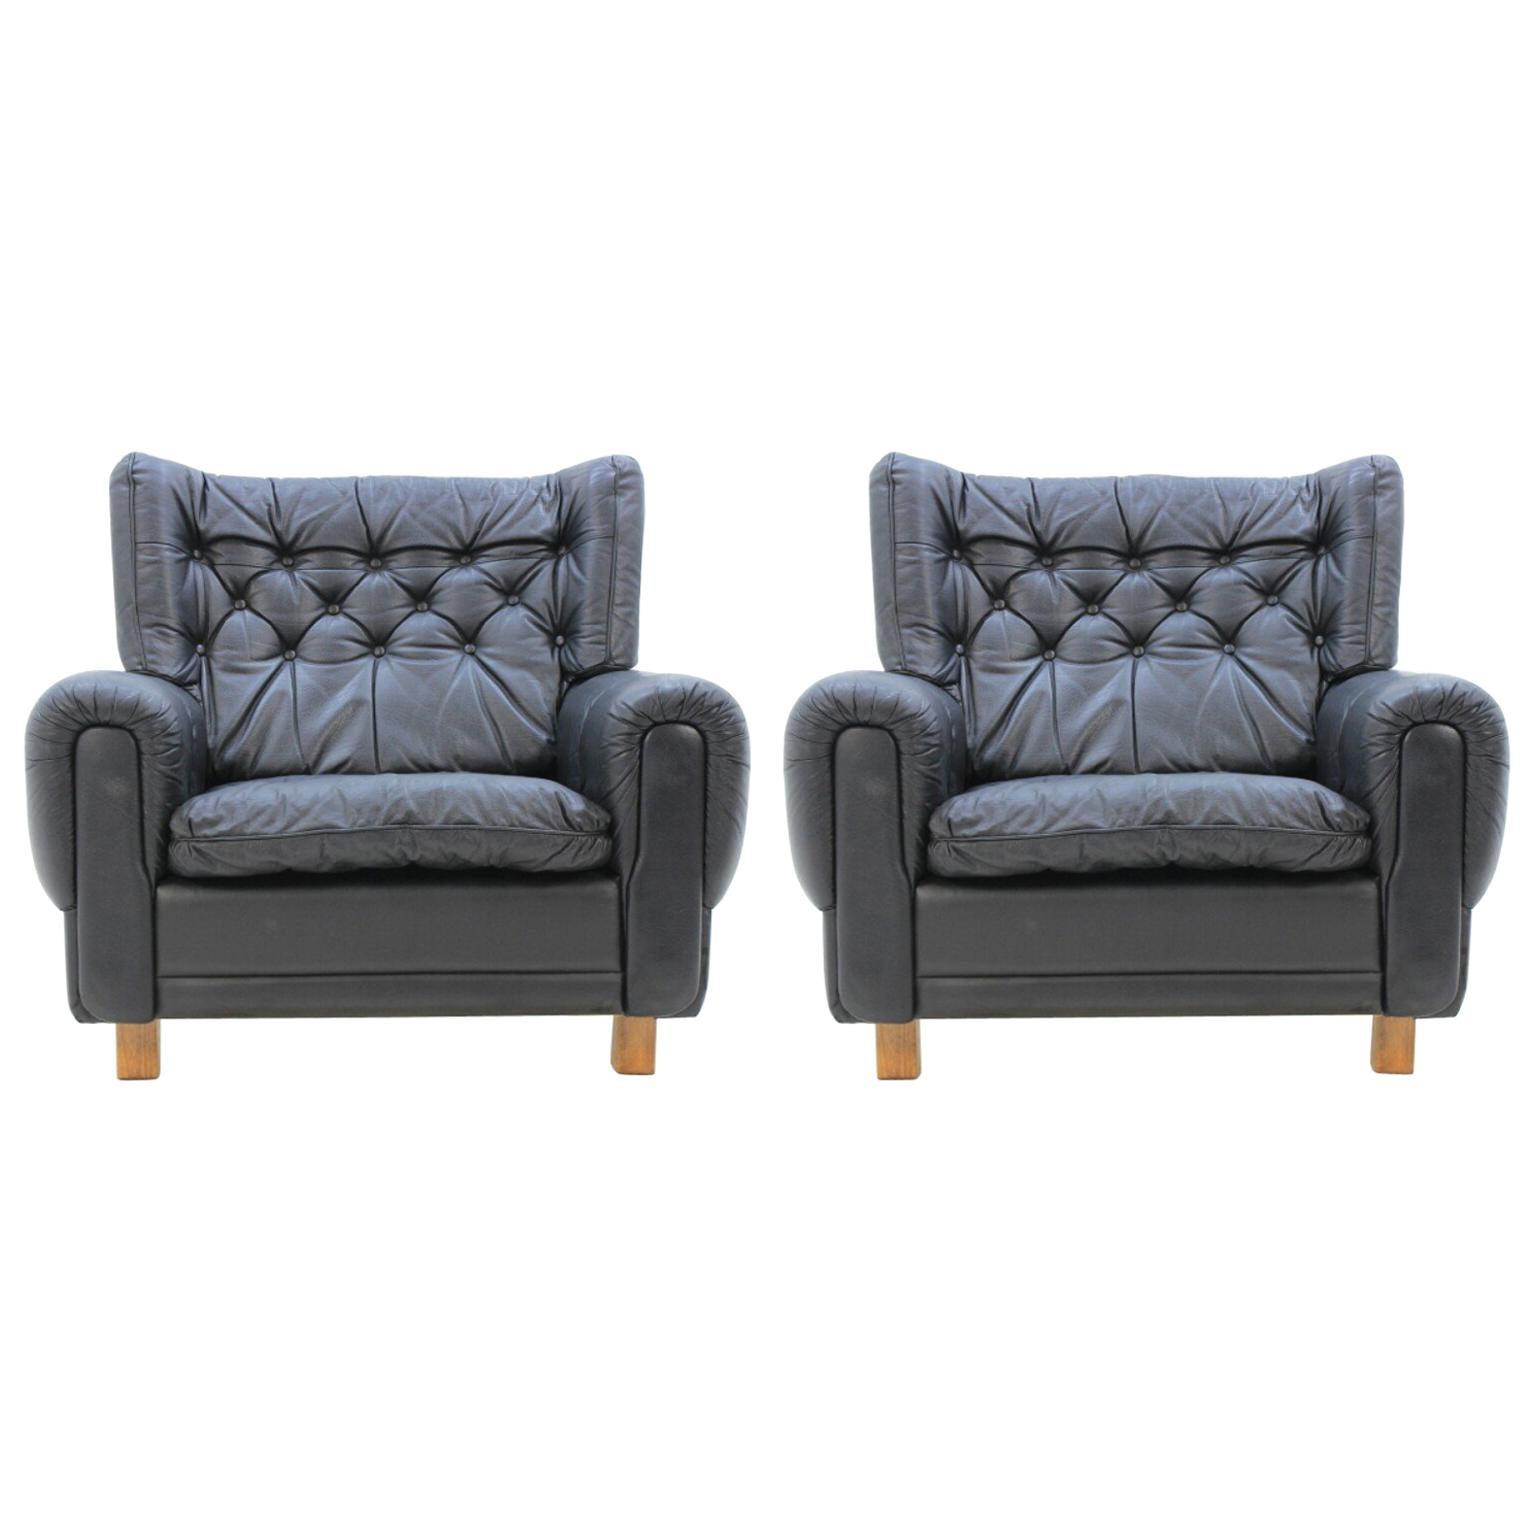 Set of Midcentury Black Leather Armchairs, 1970s